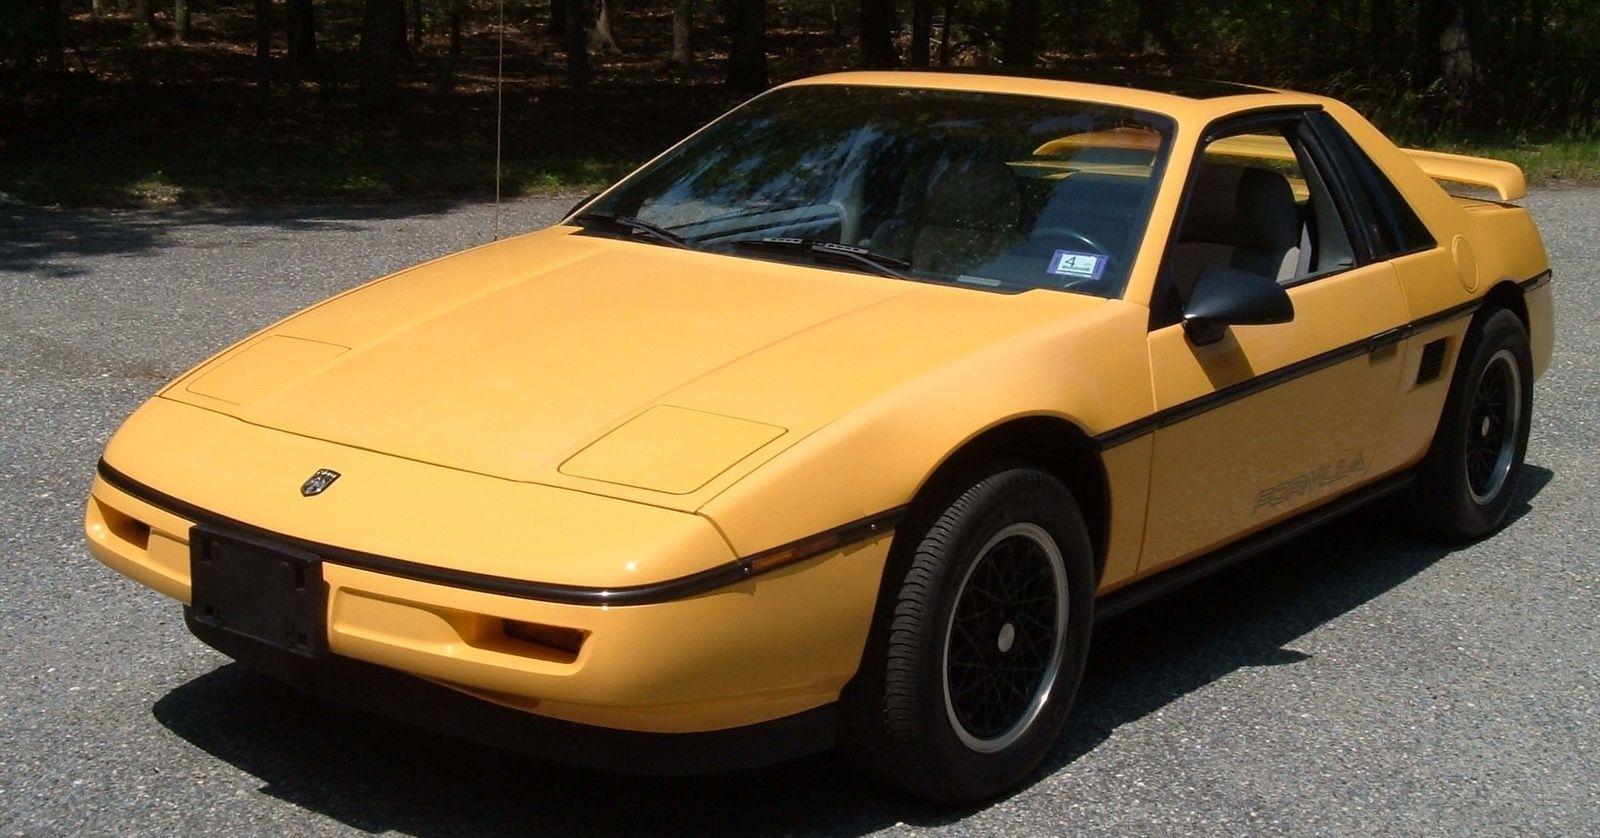 1988 Pontiac Fiero Formula picture, exterior